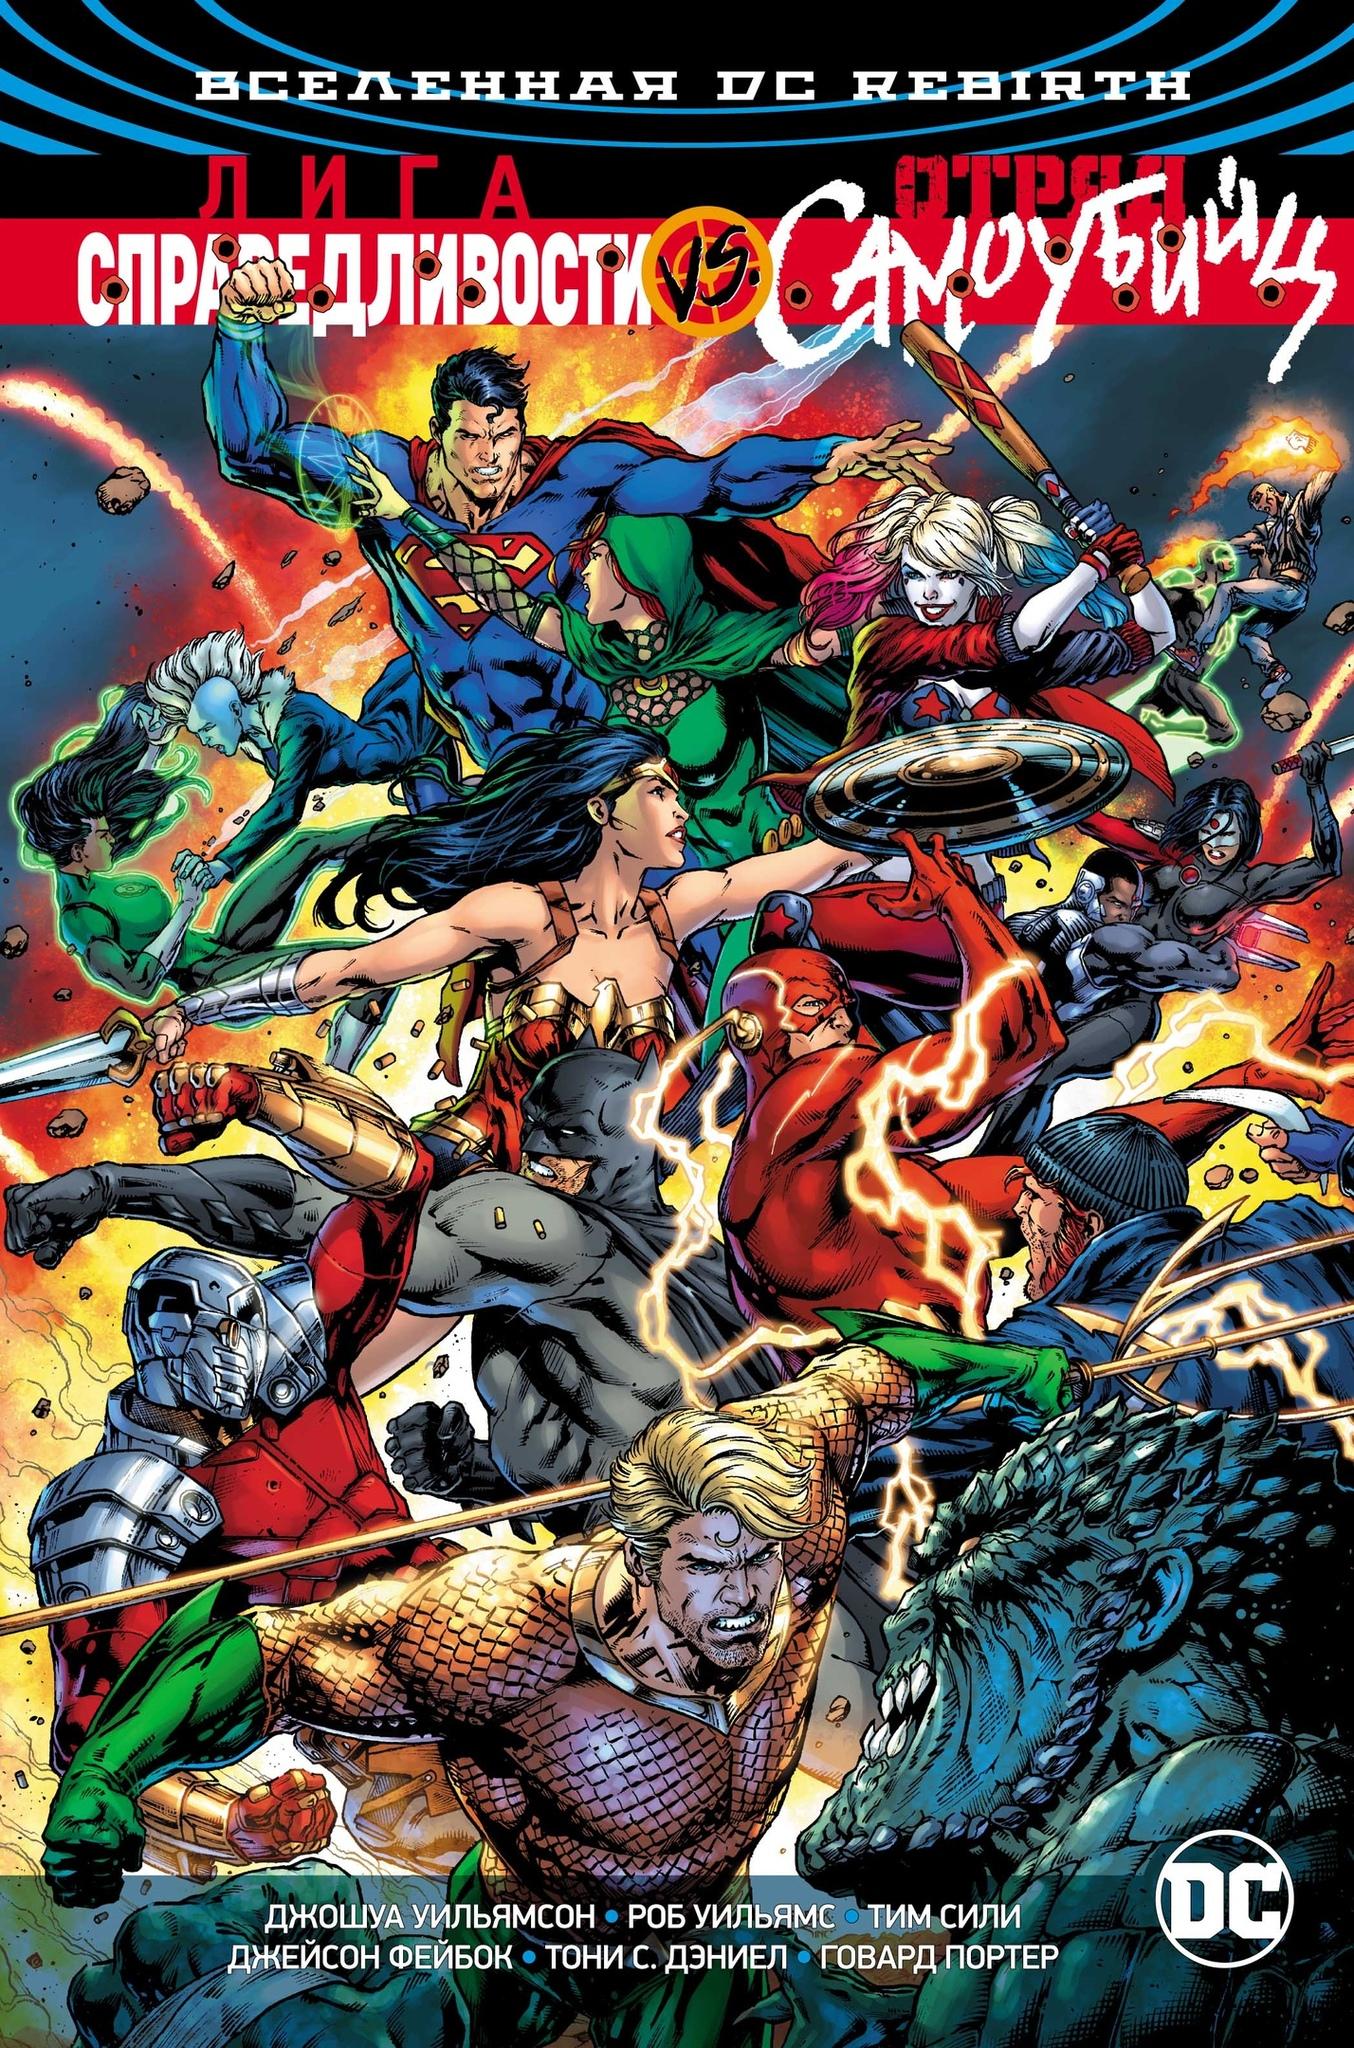 Вселенная DC Rebirth. Лига Справедливости против Отряда Самоубийц